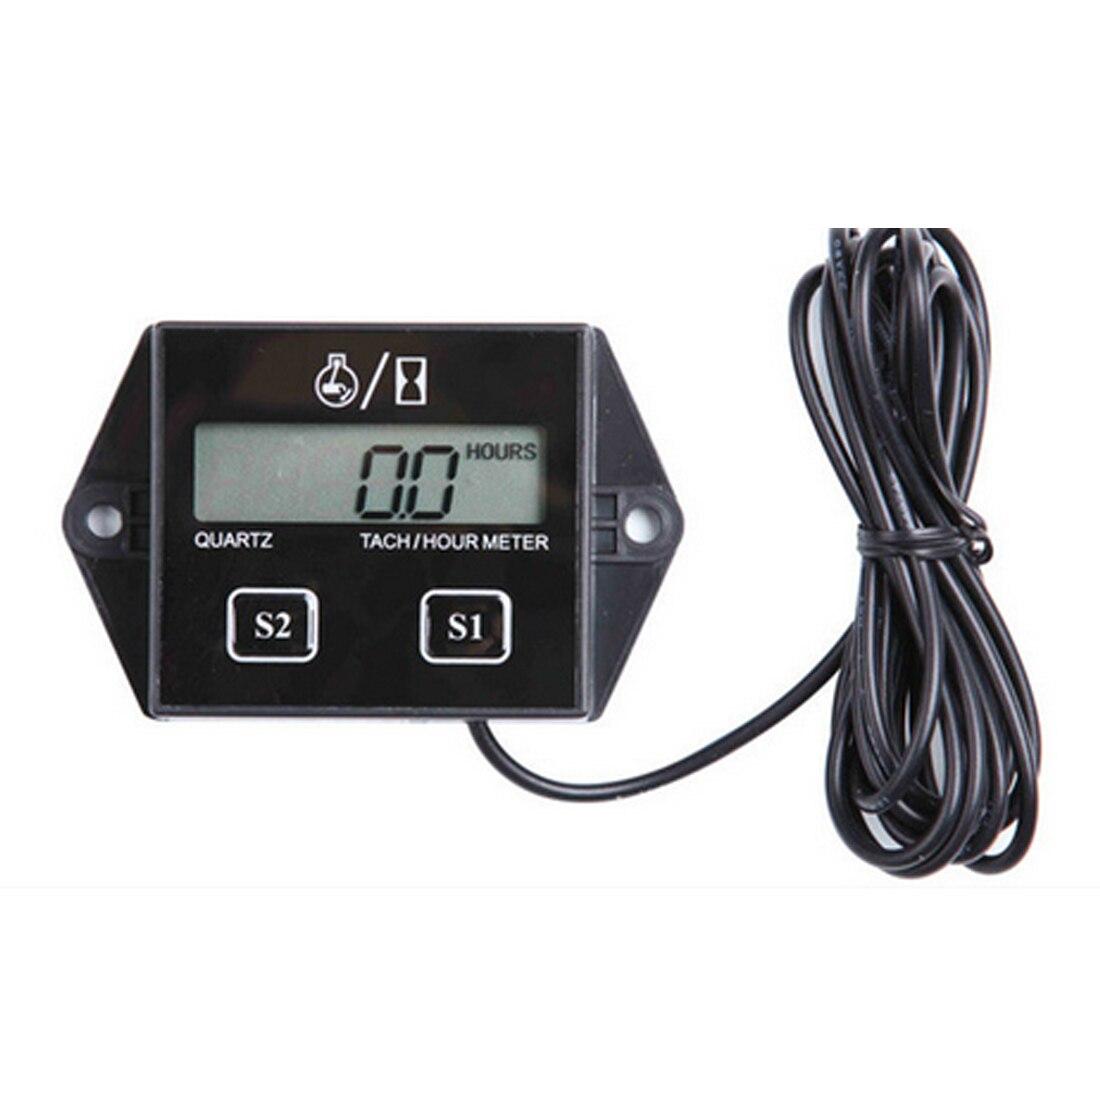 LCD Display Digitaler Tachometer Motor Tach Stunde Meter Gauge Induktive Für Motorrad Motor Boot Auto Hub Motor